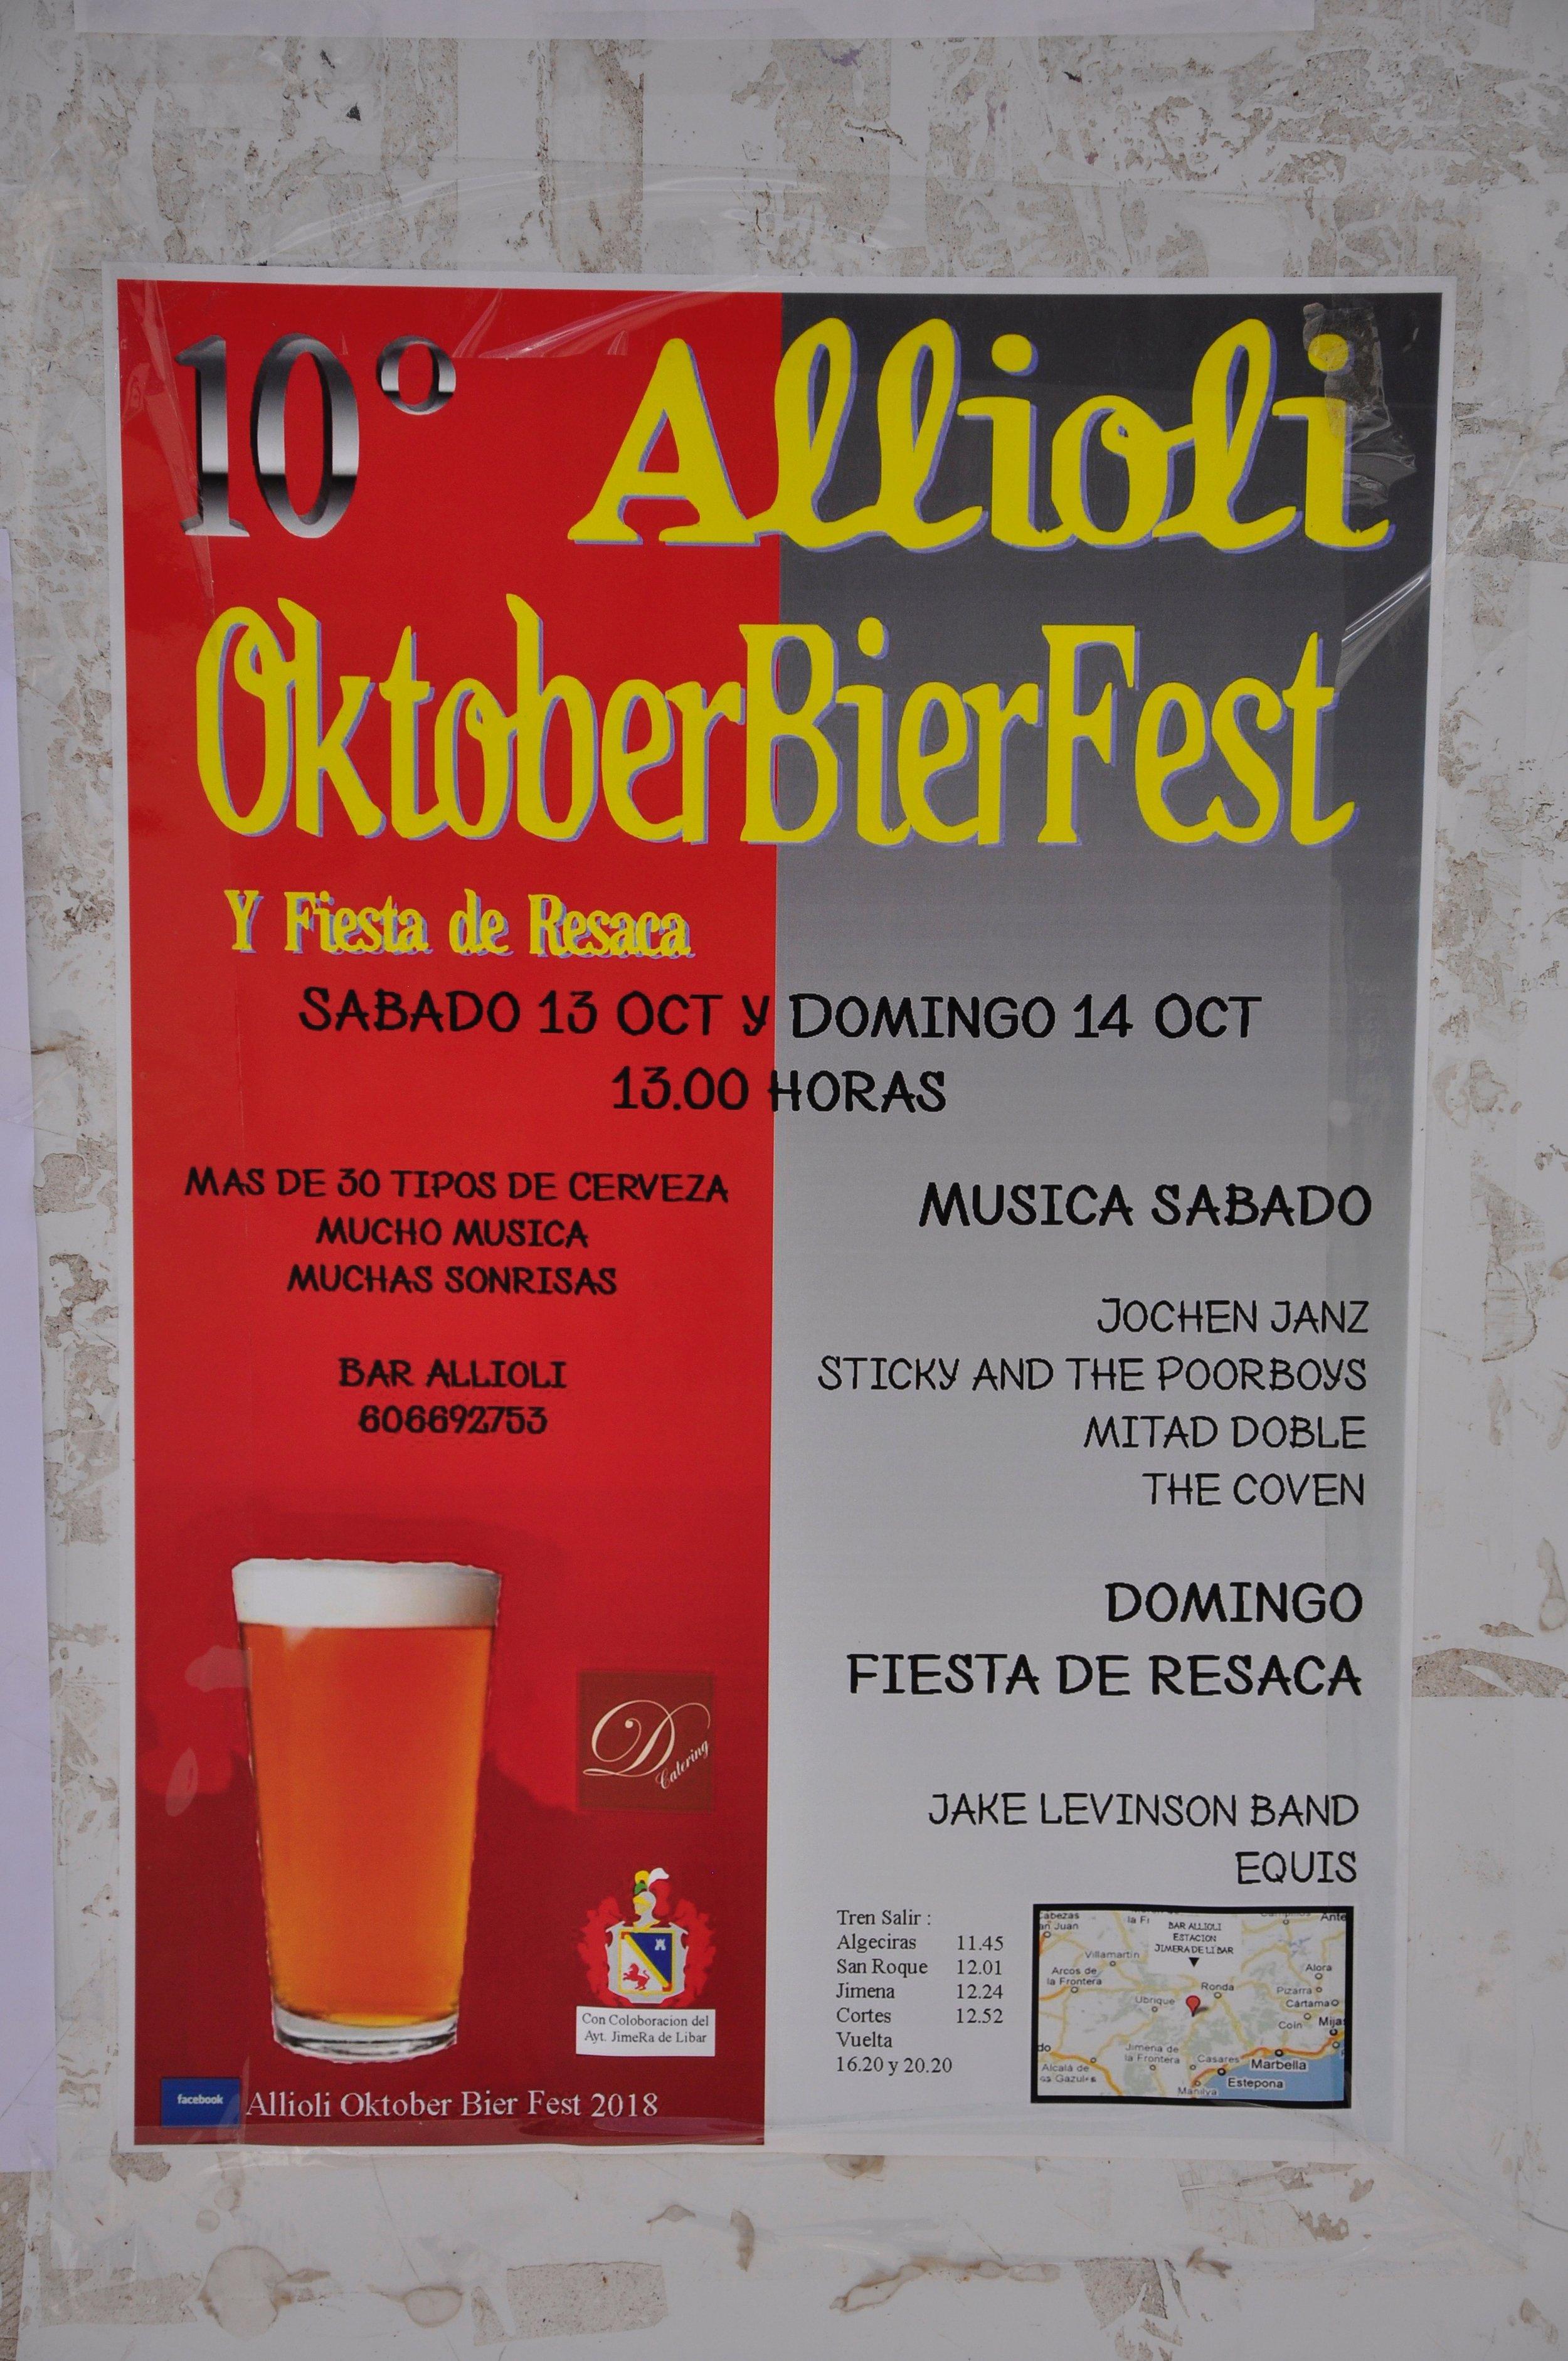 octoberfest-jimera-de-libar.jpg